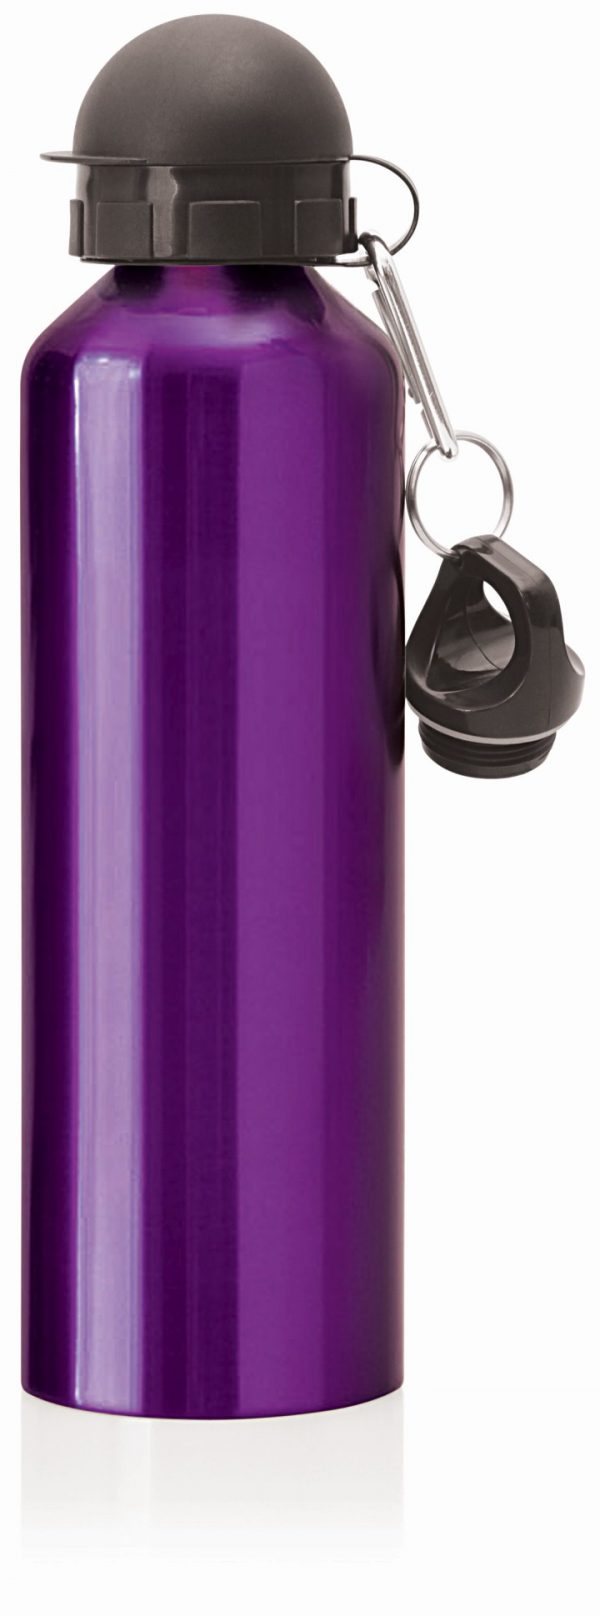 Stainless Steel Drink Bottle 750ml -  M245